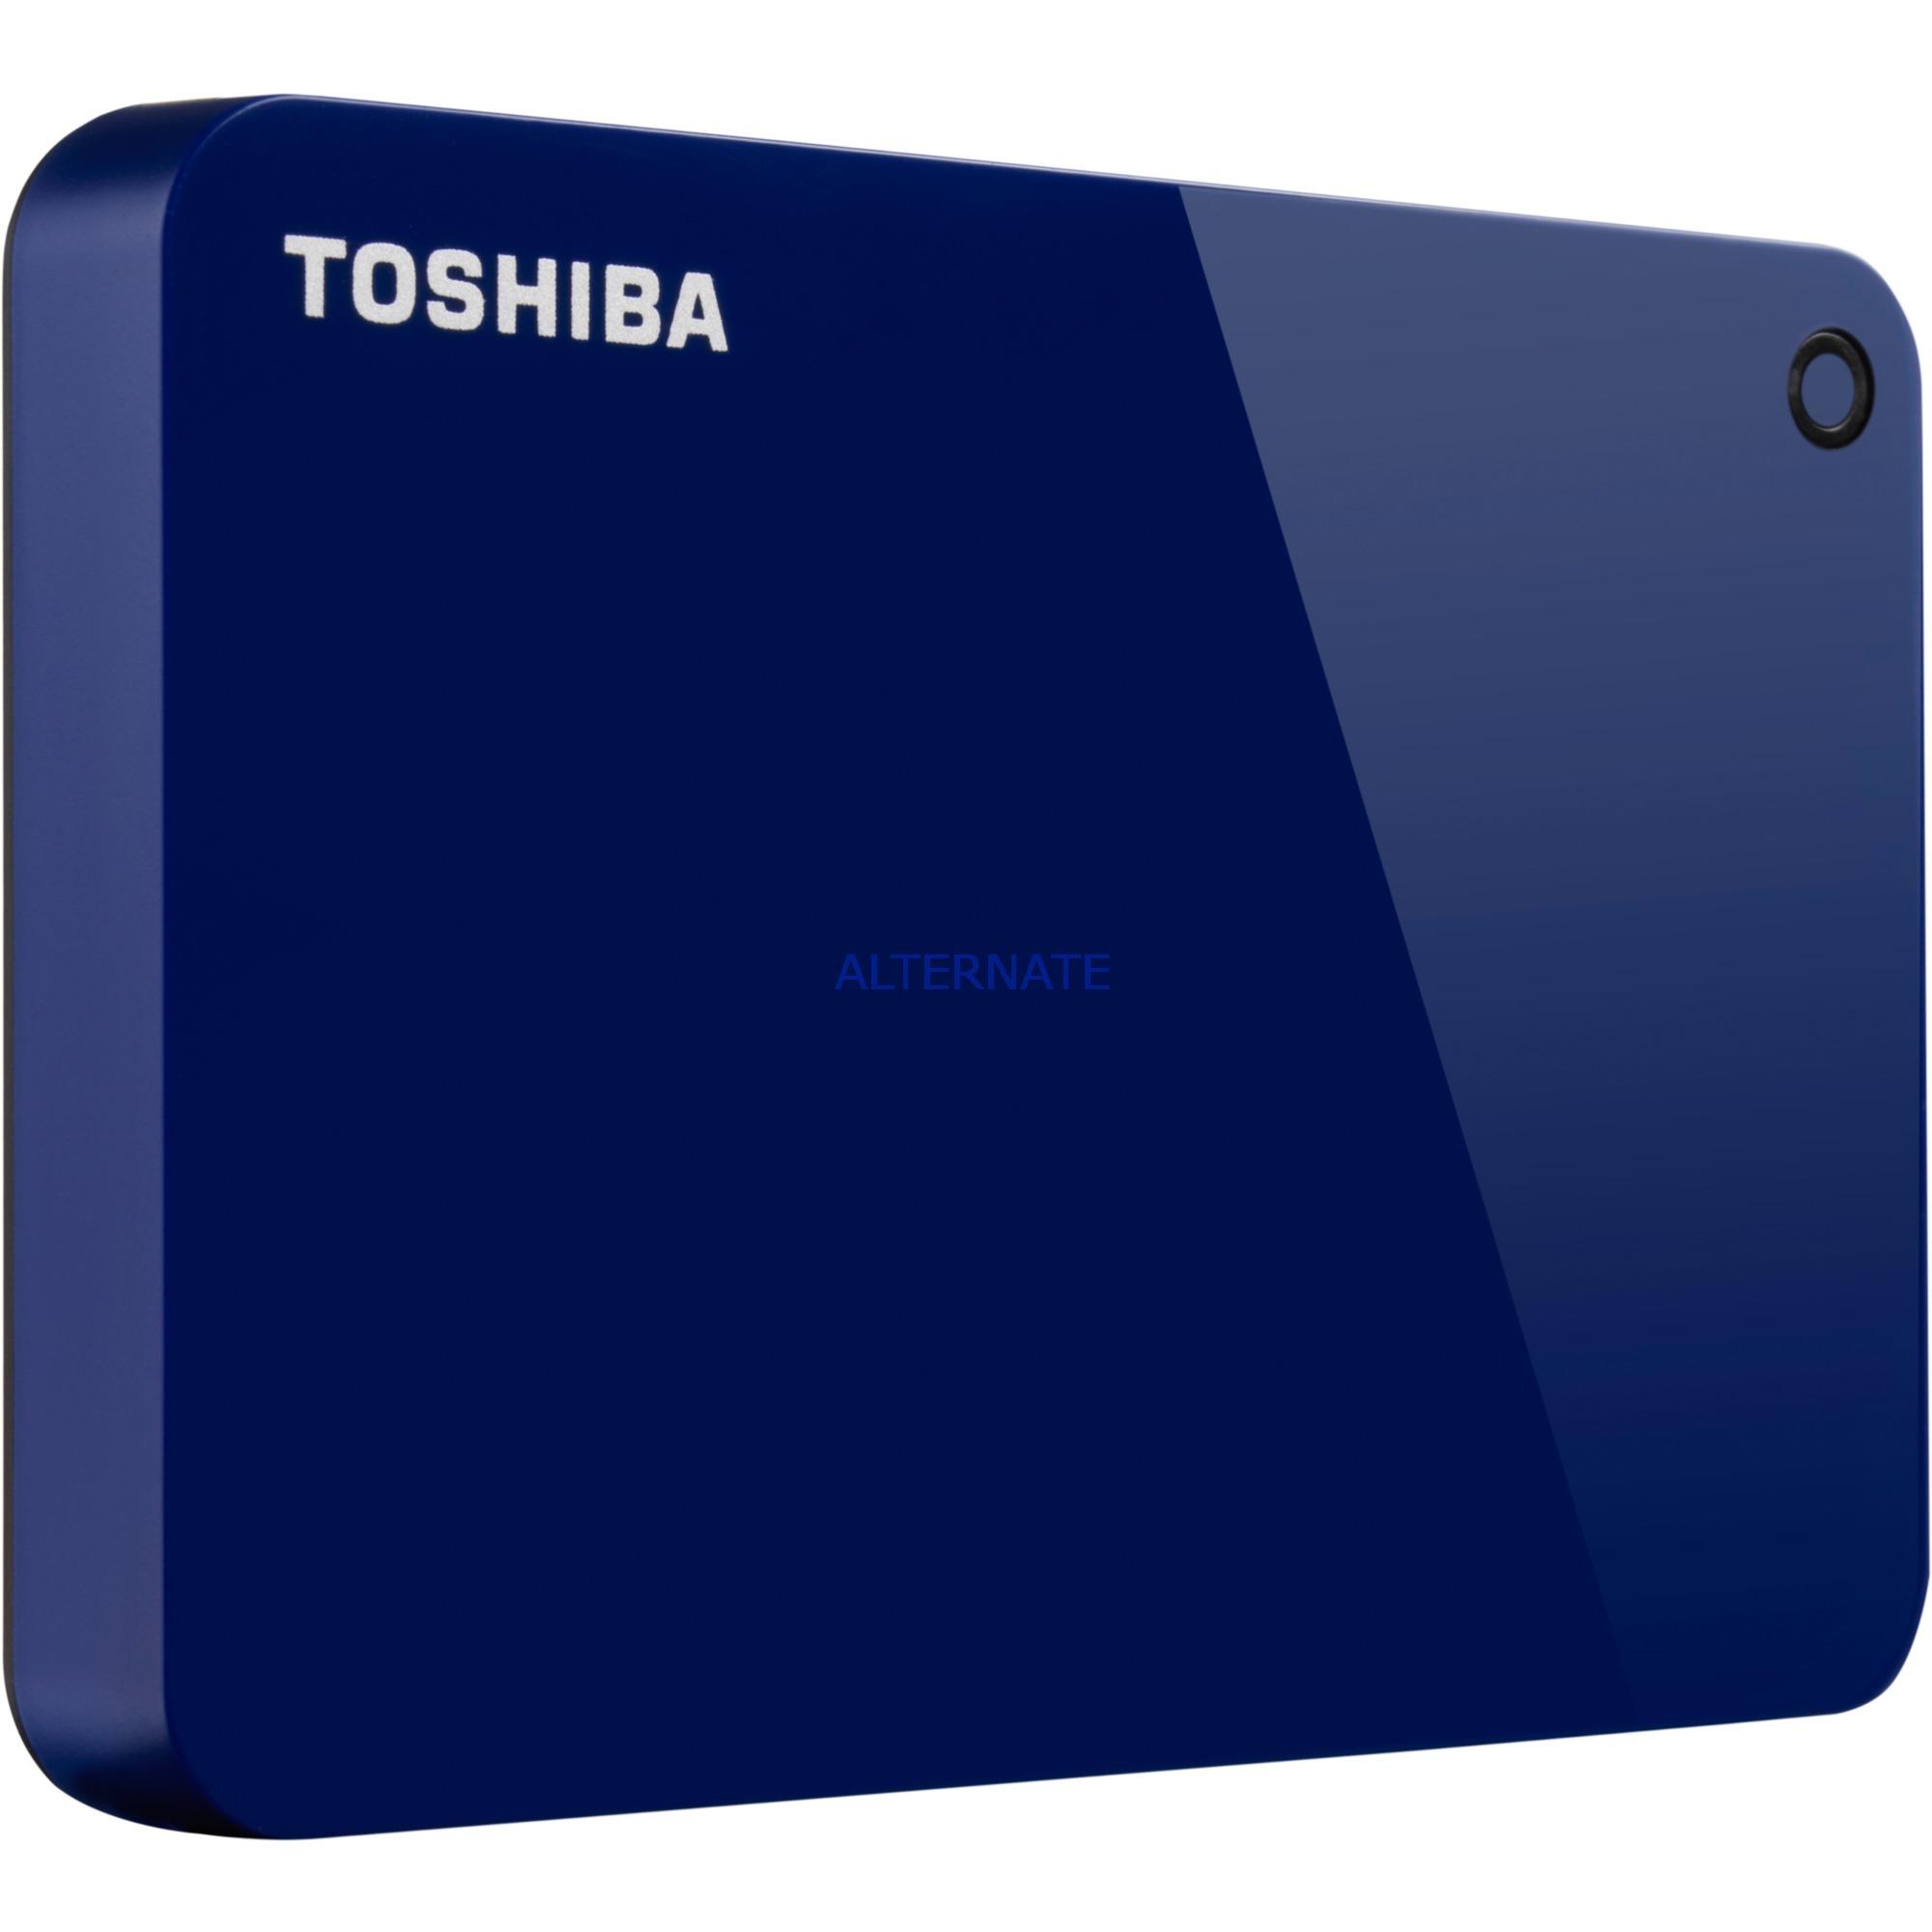 Canvio Advance disco duro externo 1000 GB Azul, Unidad de disco duro